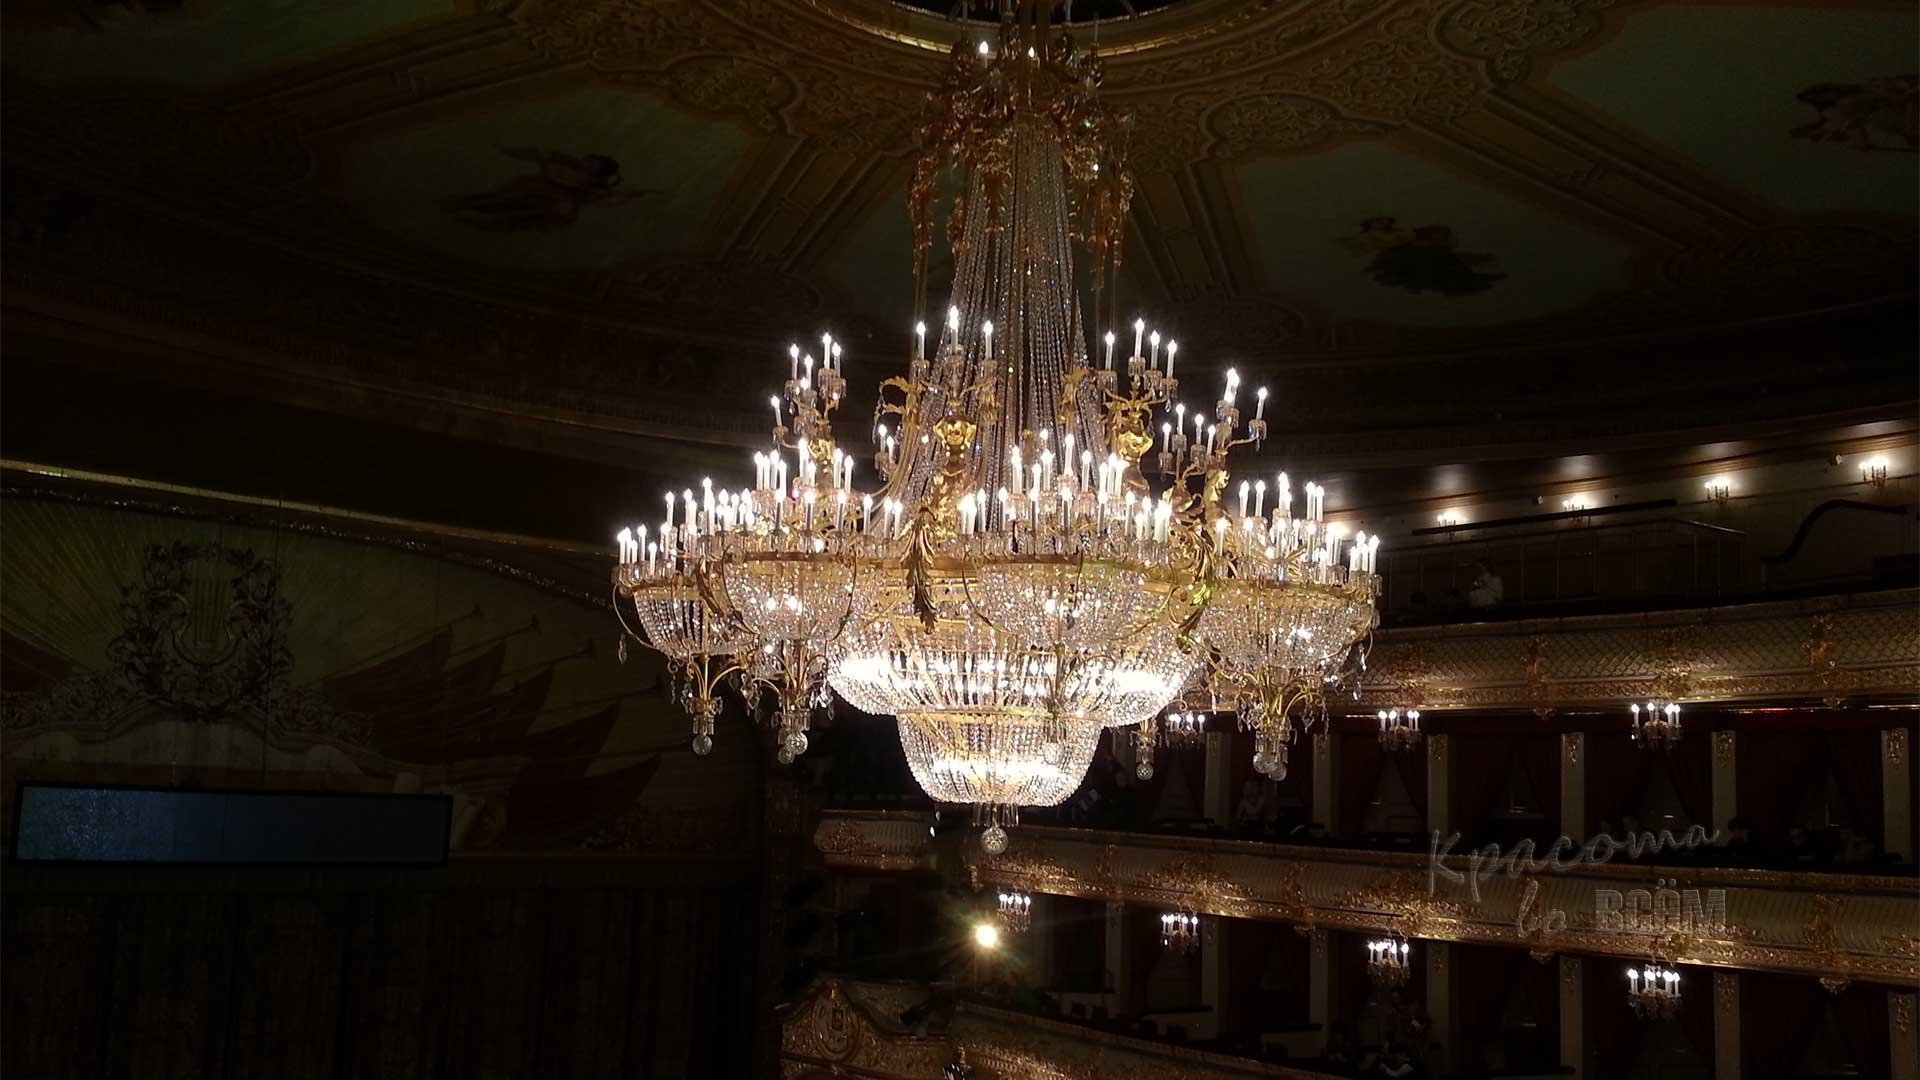 Театр, балкон, Большой театр, этикет http://krasotavovsem.ru/